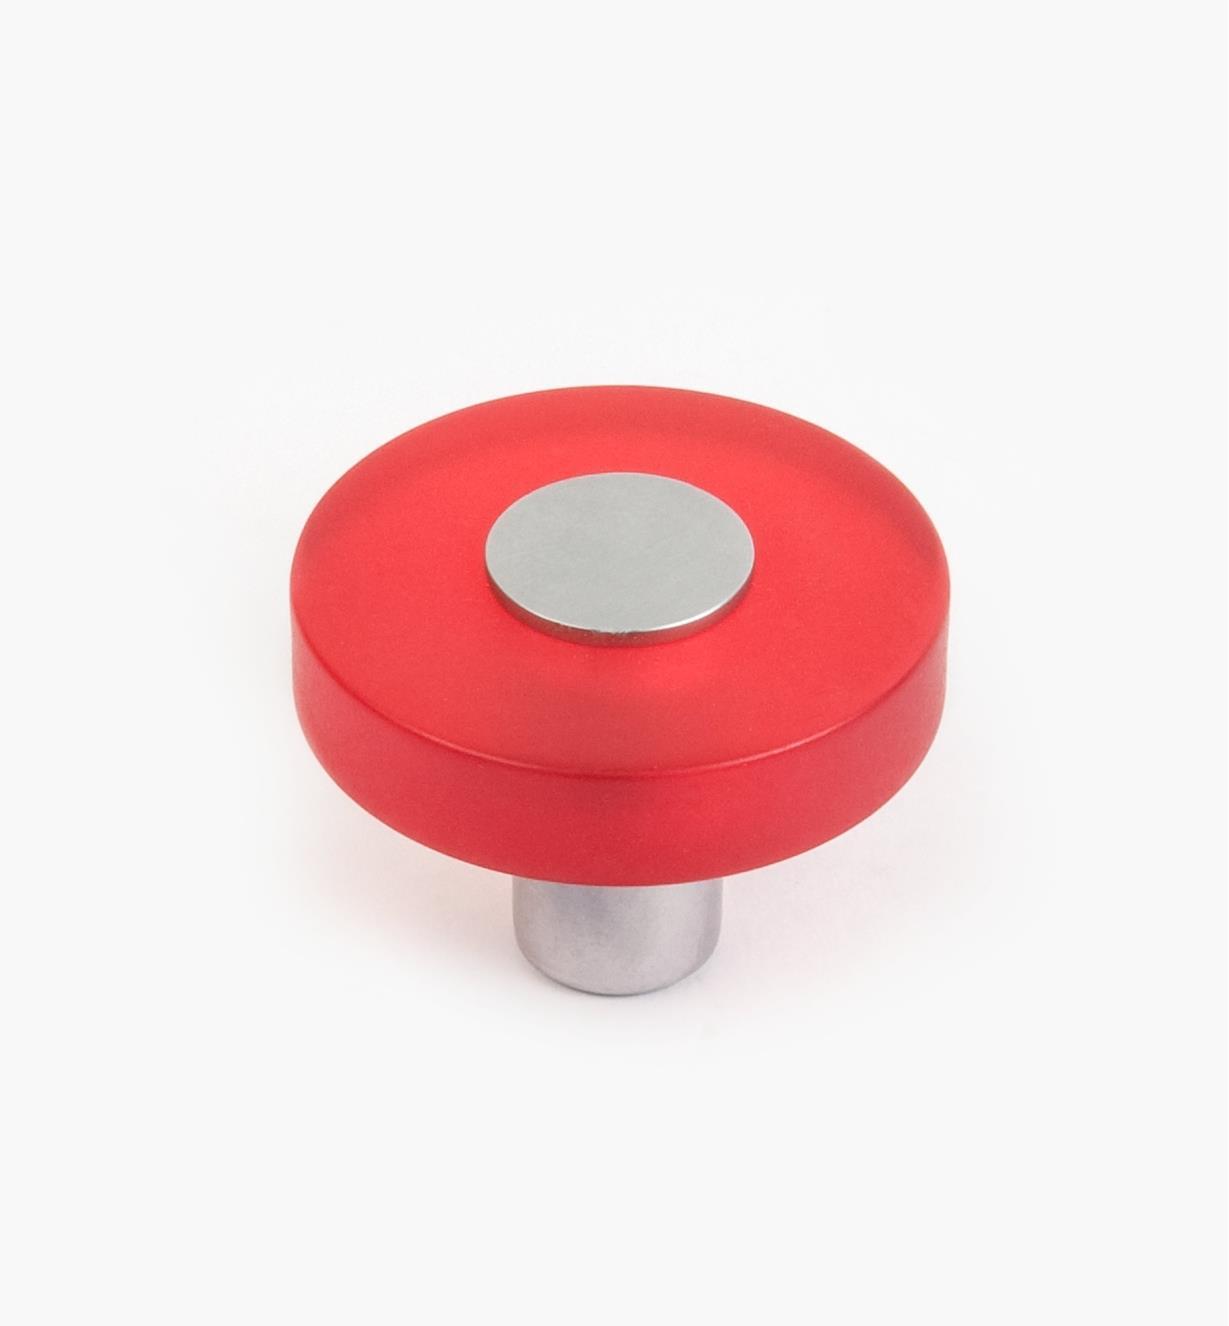 01W1161 - Malaga Hardware, Red Round Knob